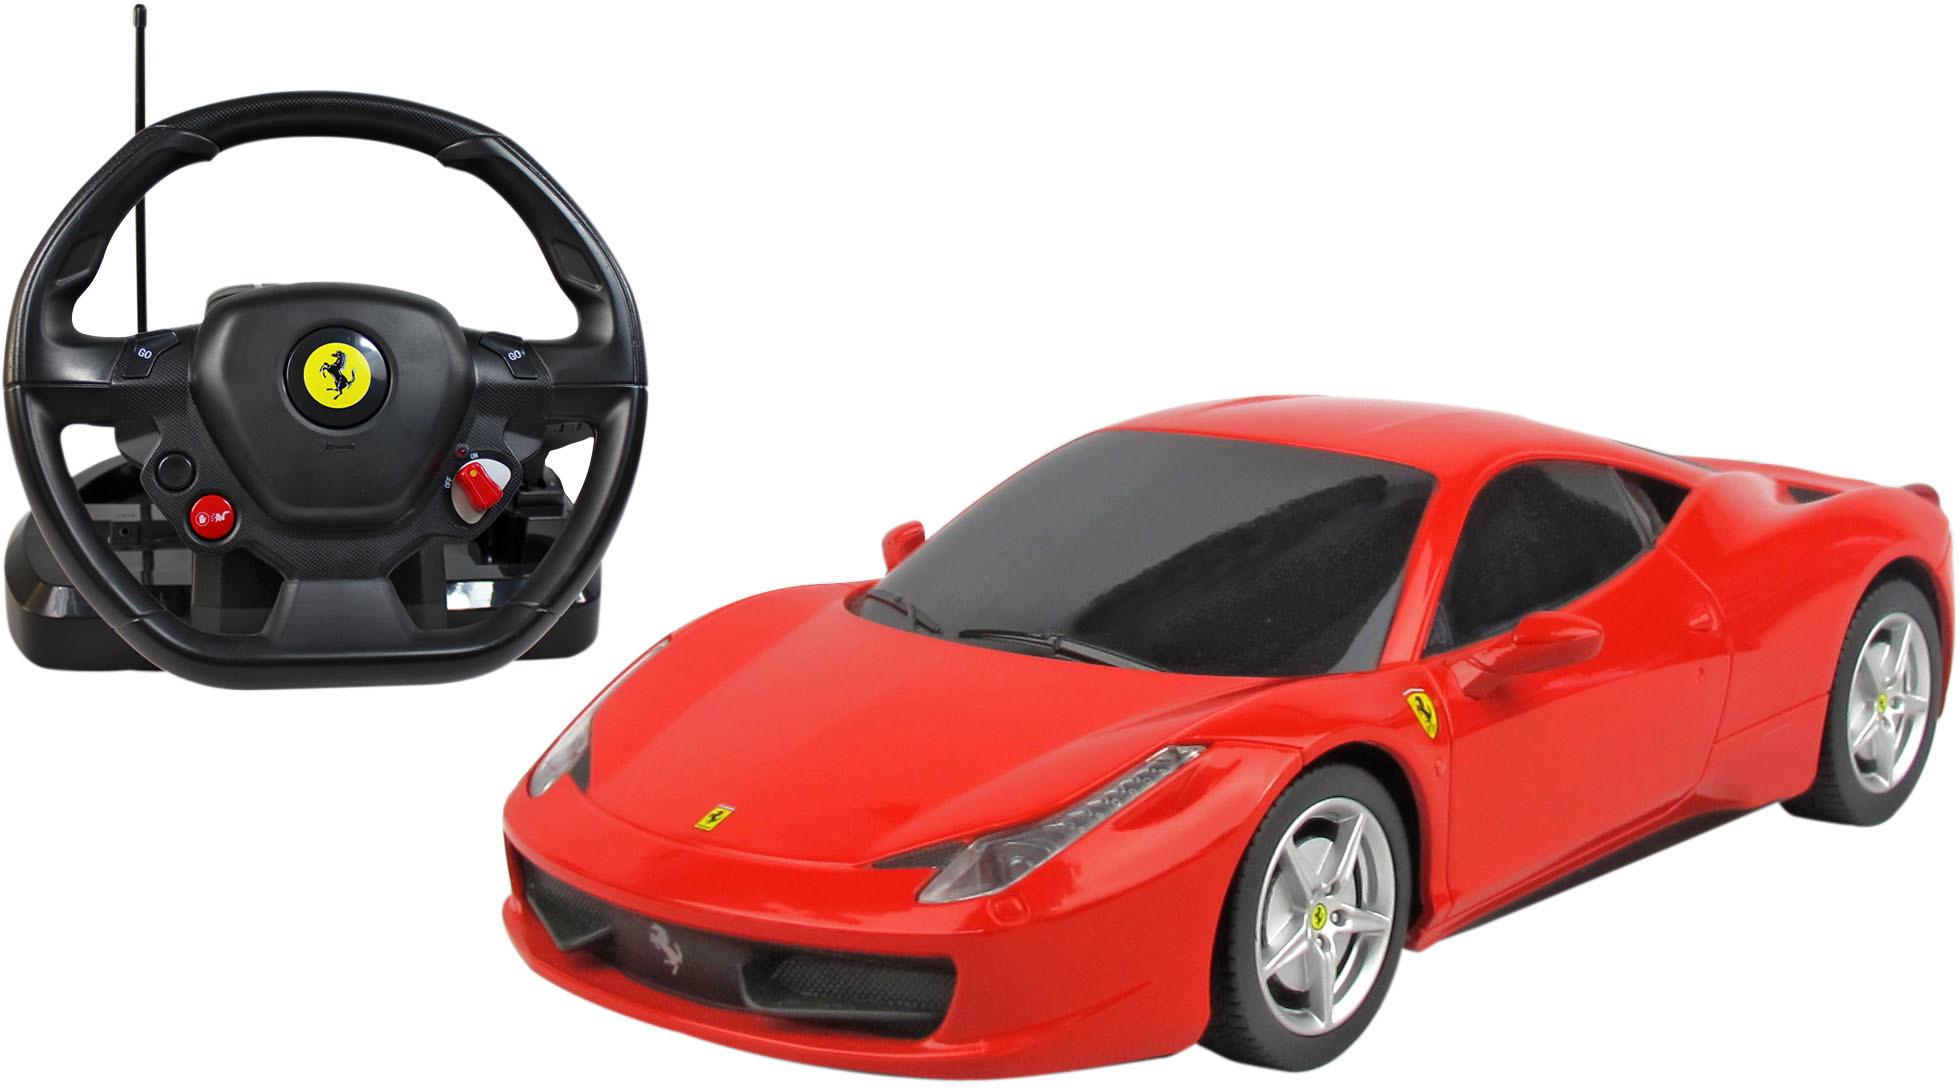 Toys Toys Ferrari 458 Buy Ferrari 458 Italia Toys in